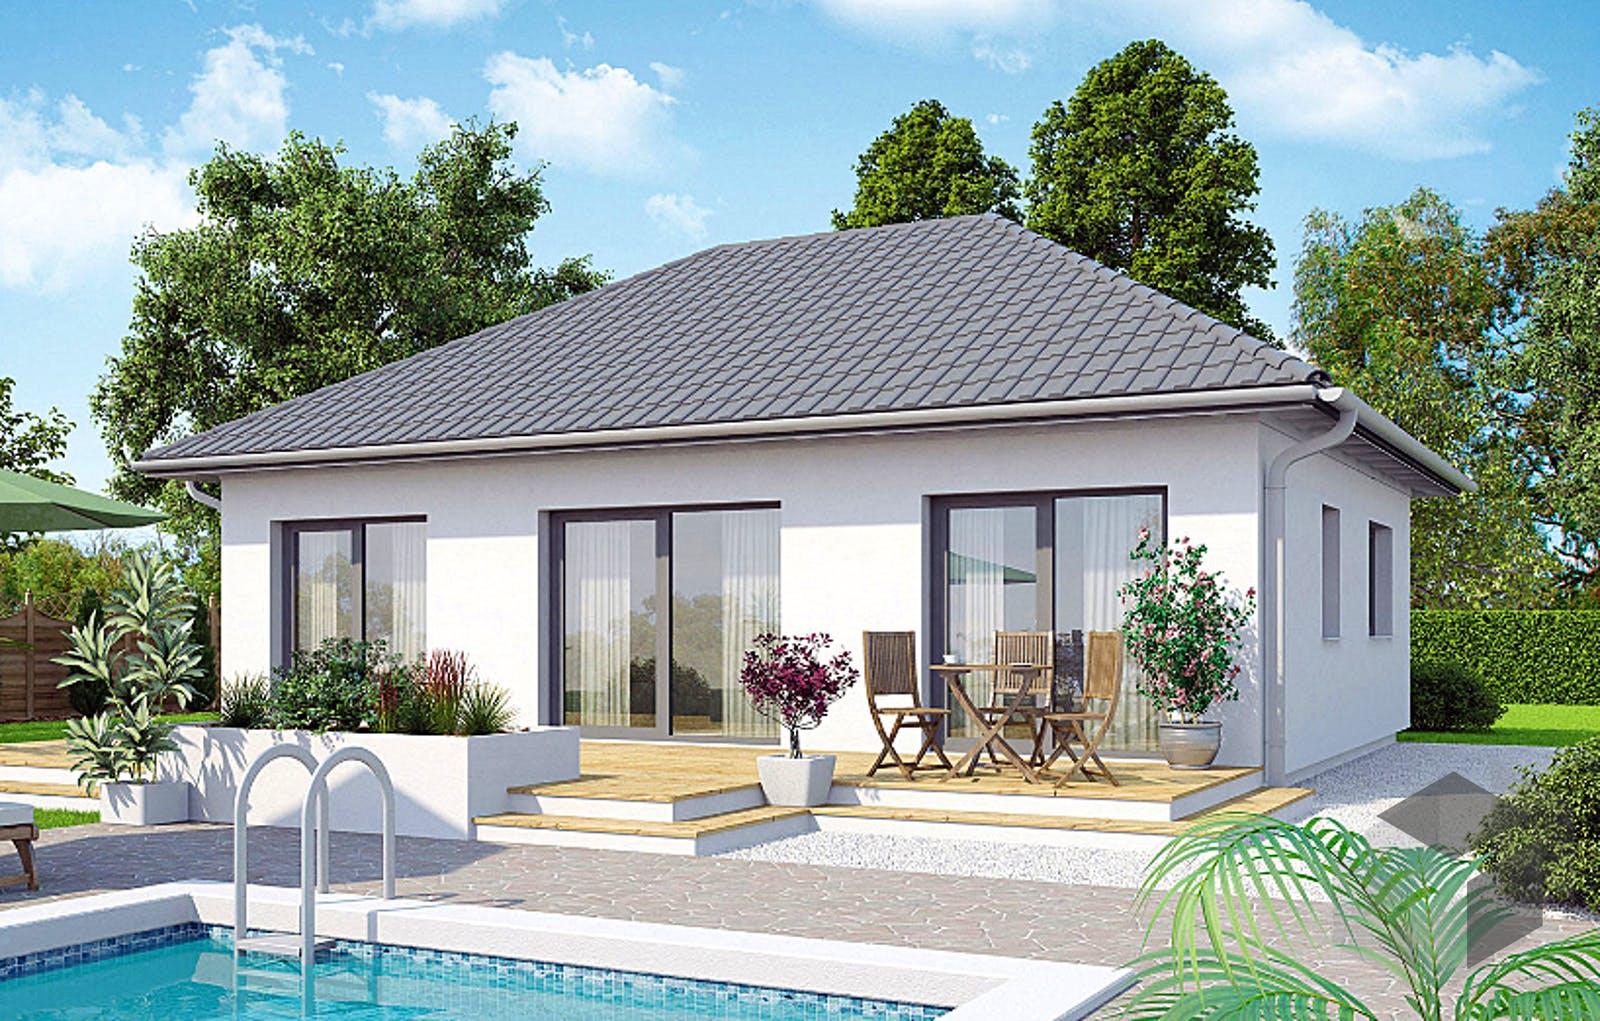 bungalow new design v small inactive von vario haus komplette daten bersicht. Black Bedroom Furniture Sets. Home Design Ideas